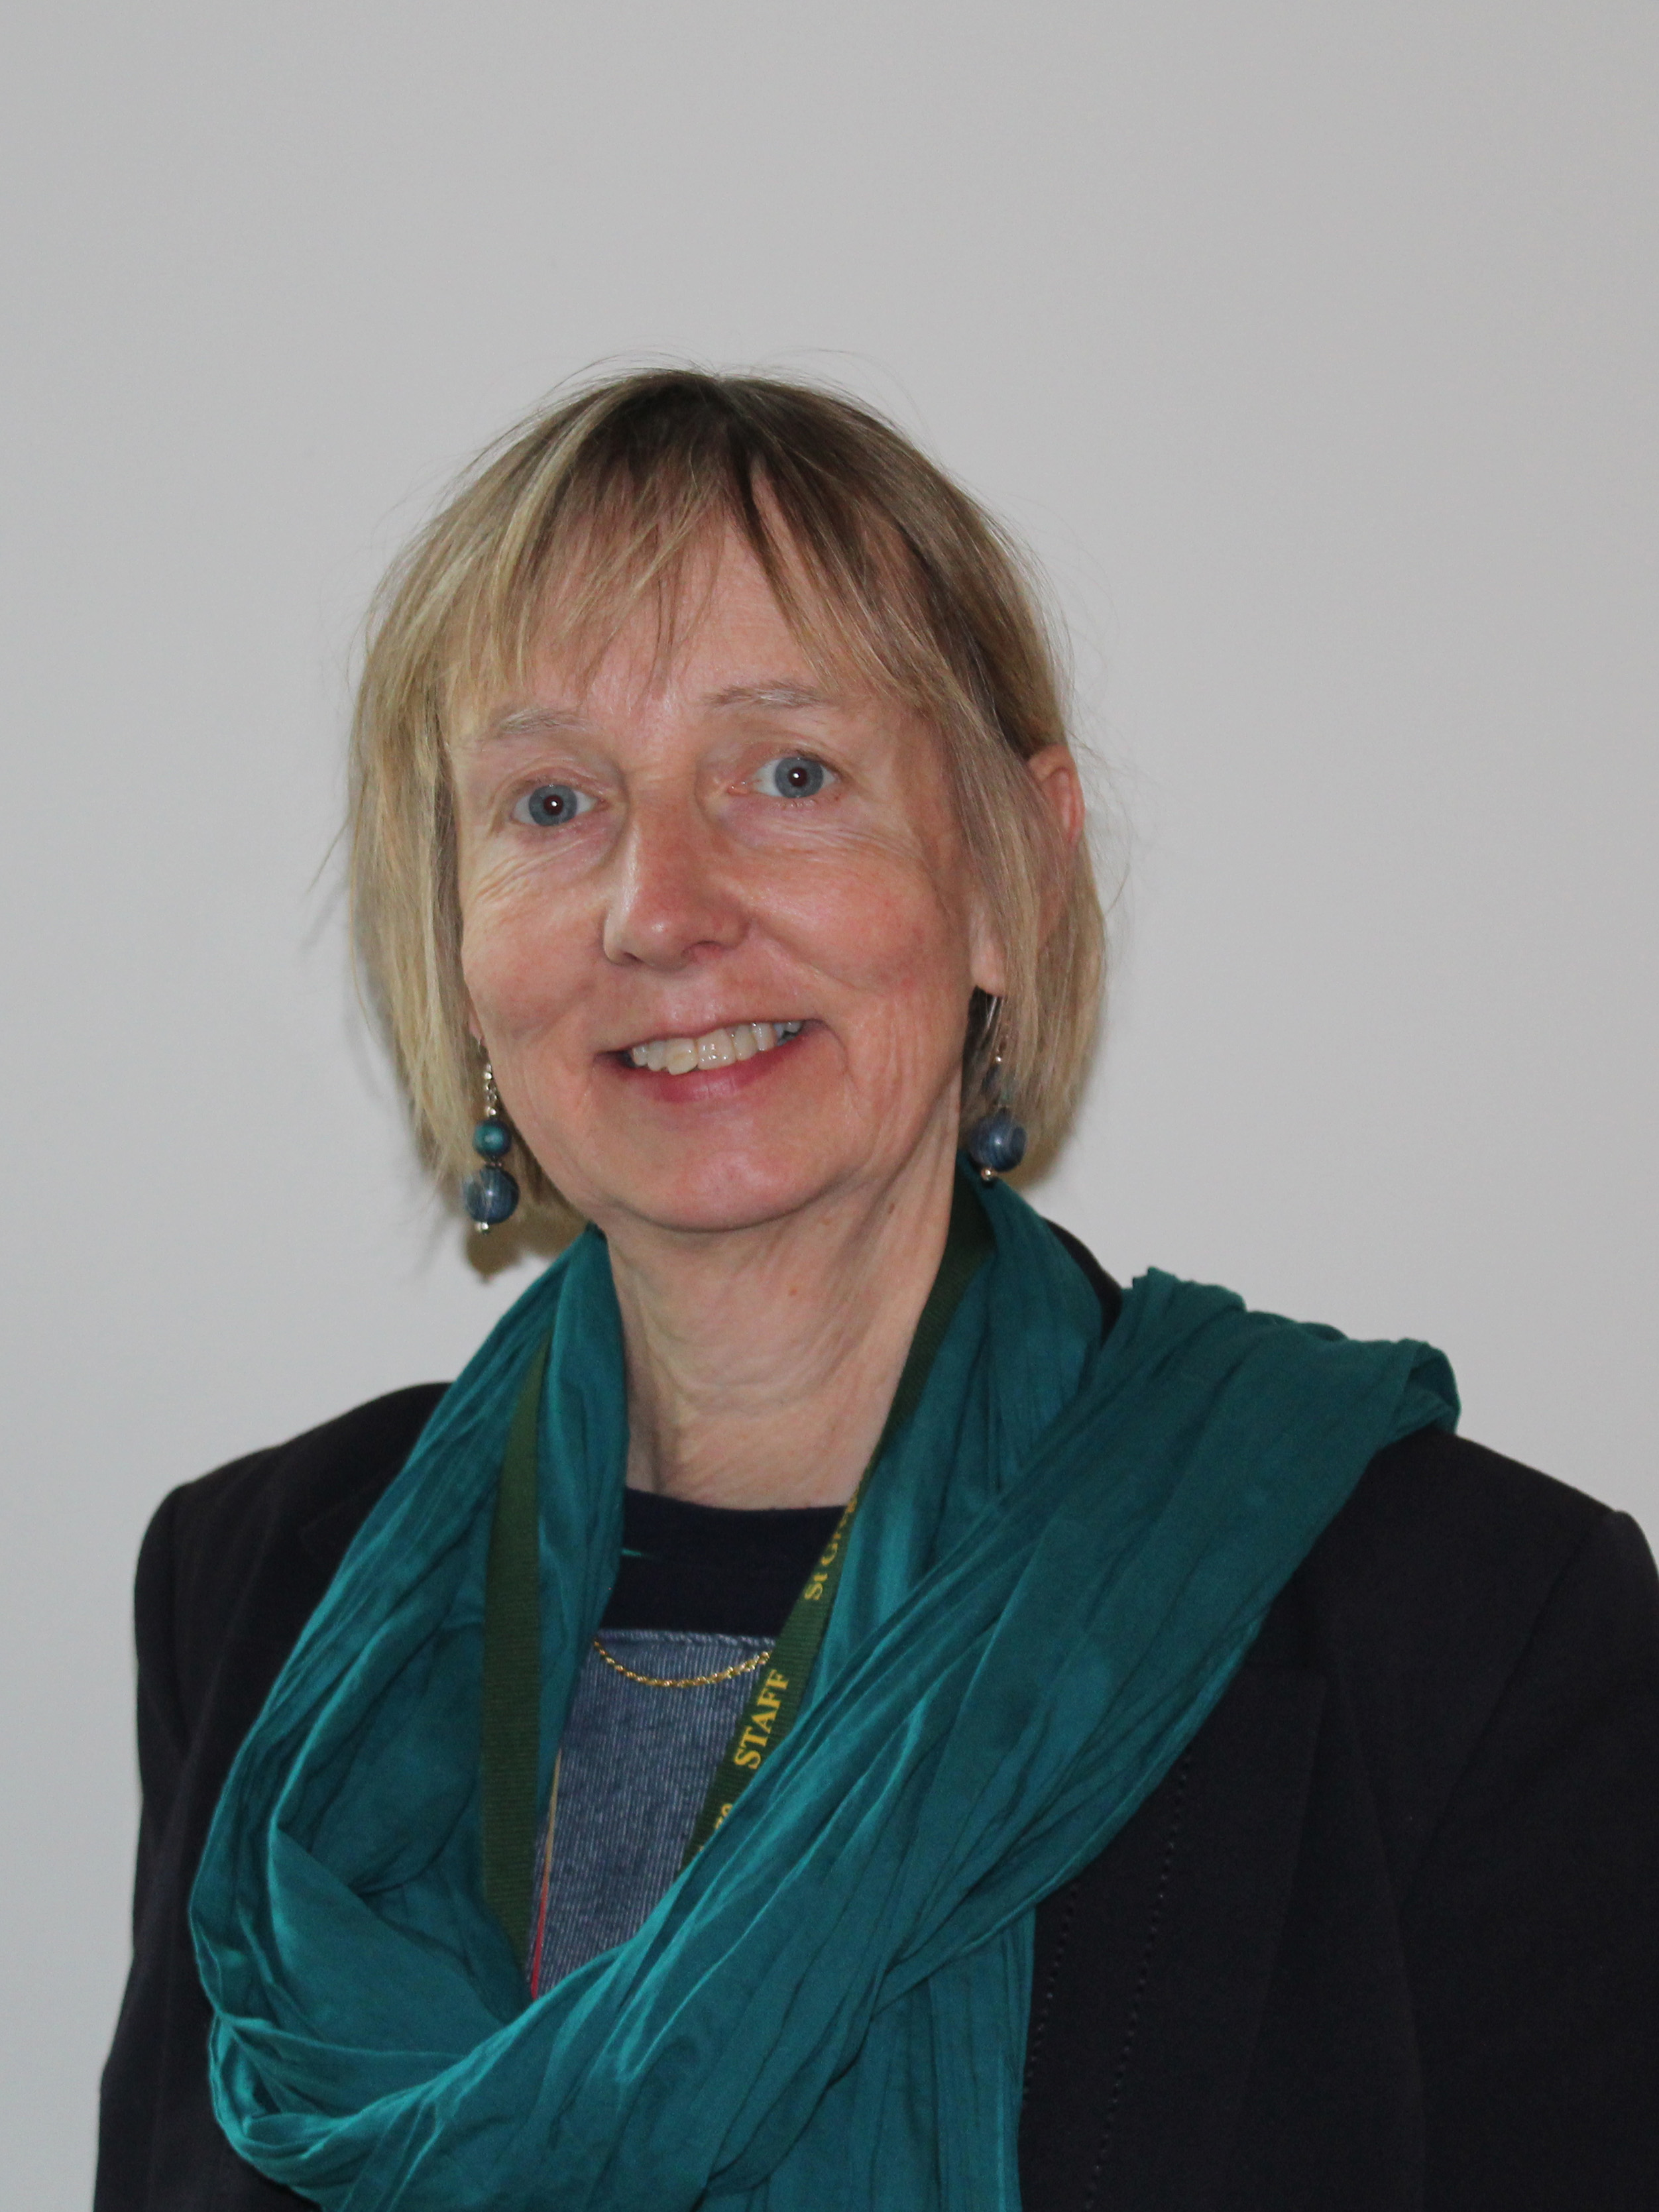 Theresa Munford